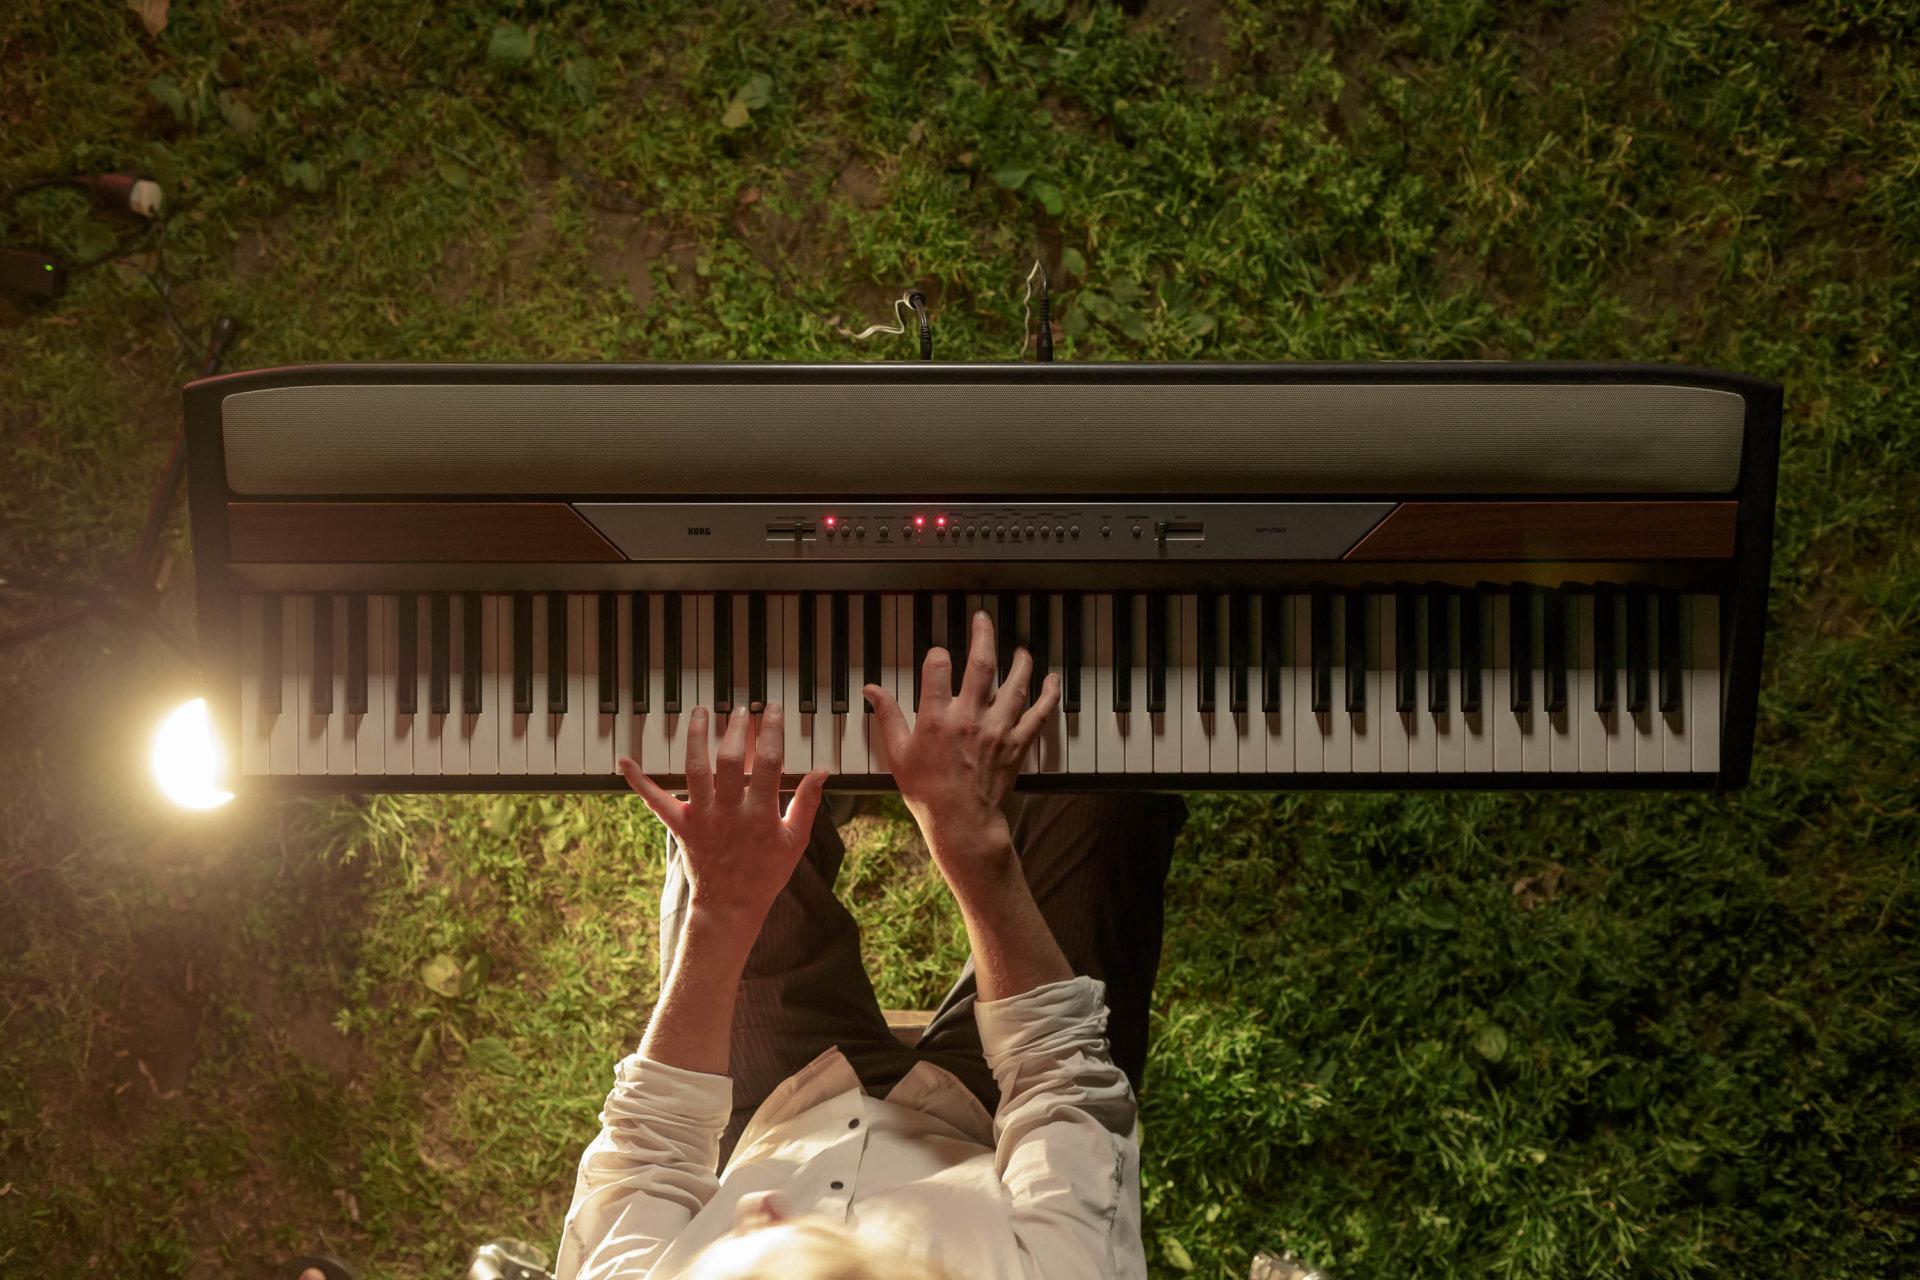 DRUCKEN!, Feuerwehr, Keyboard, Kino, Korg SP-250, Kultur, MASTERBILD, Pianist, Projekt, Serie, Tobias Rank, Wanderkino, klavier, konzert, meisterfinger, musiker, piano